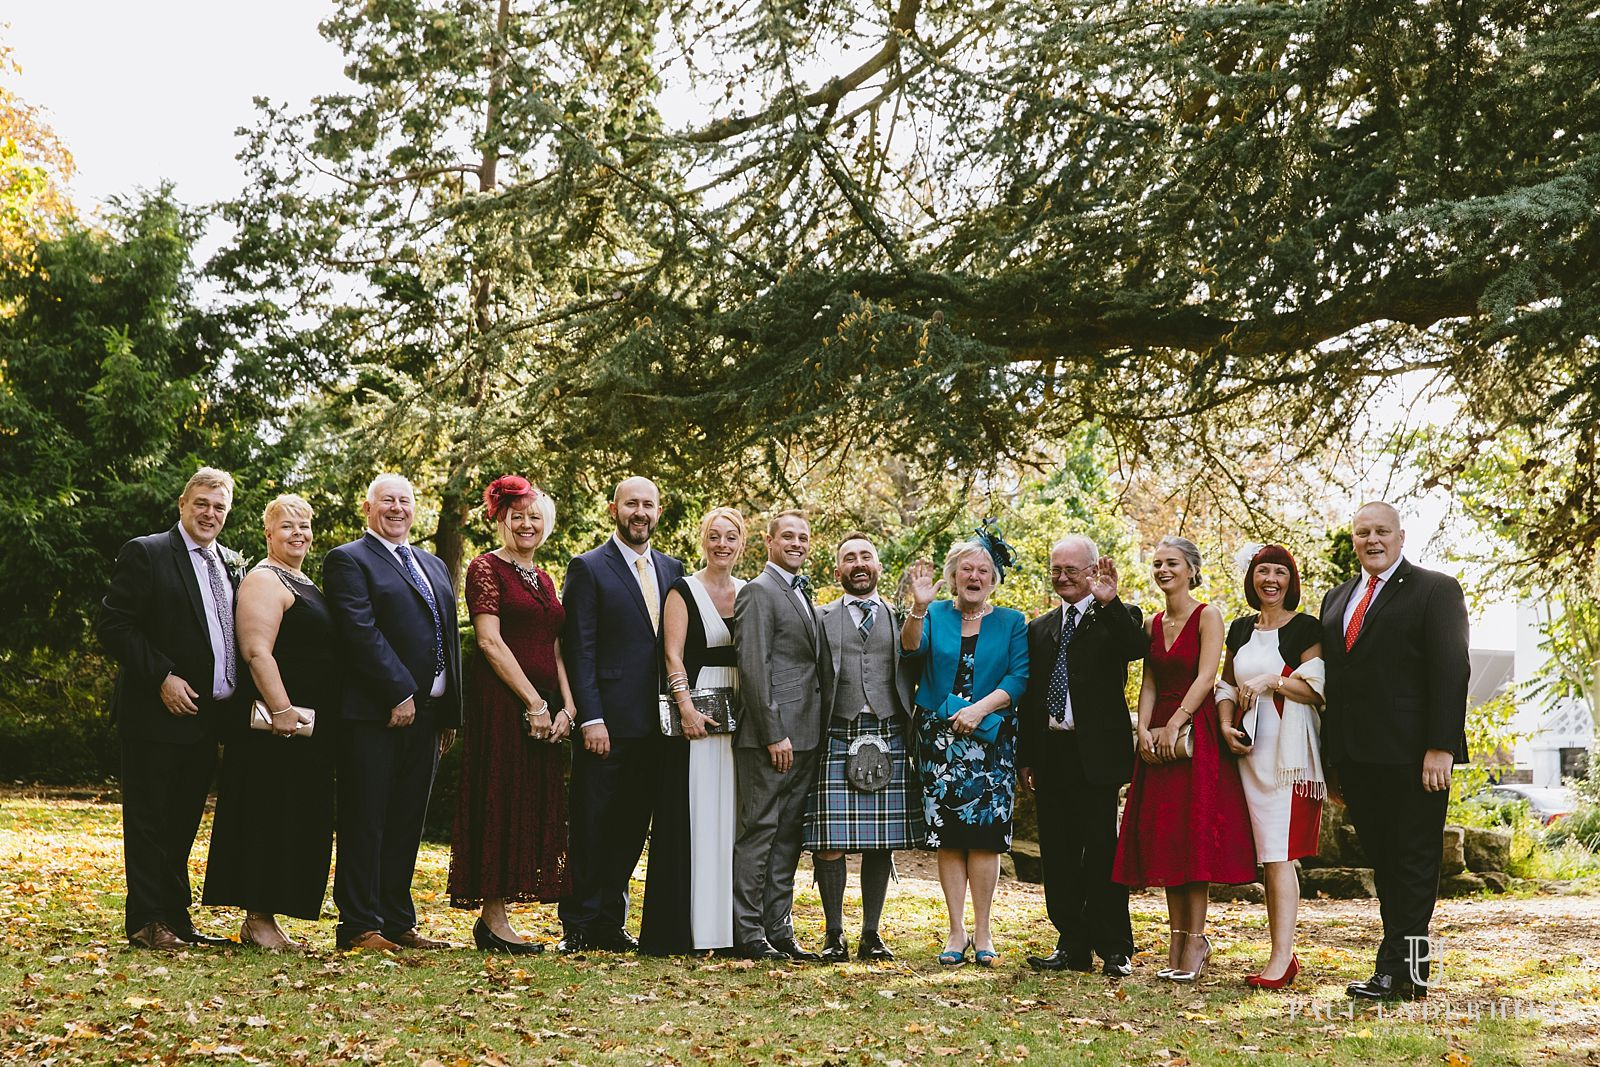 fun-group-photo-london-wedding